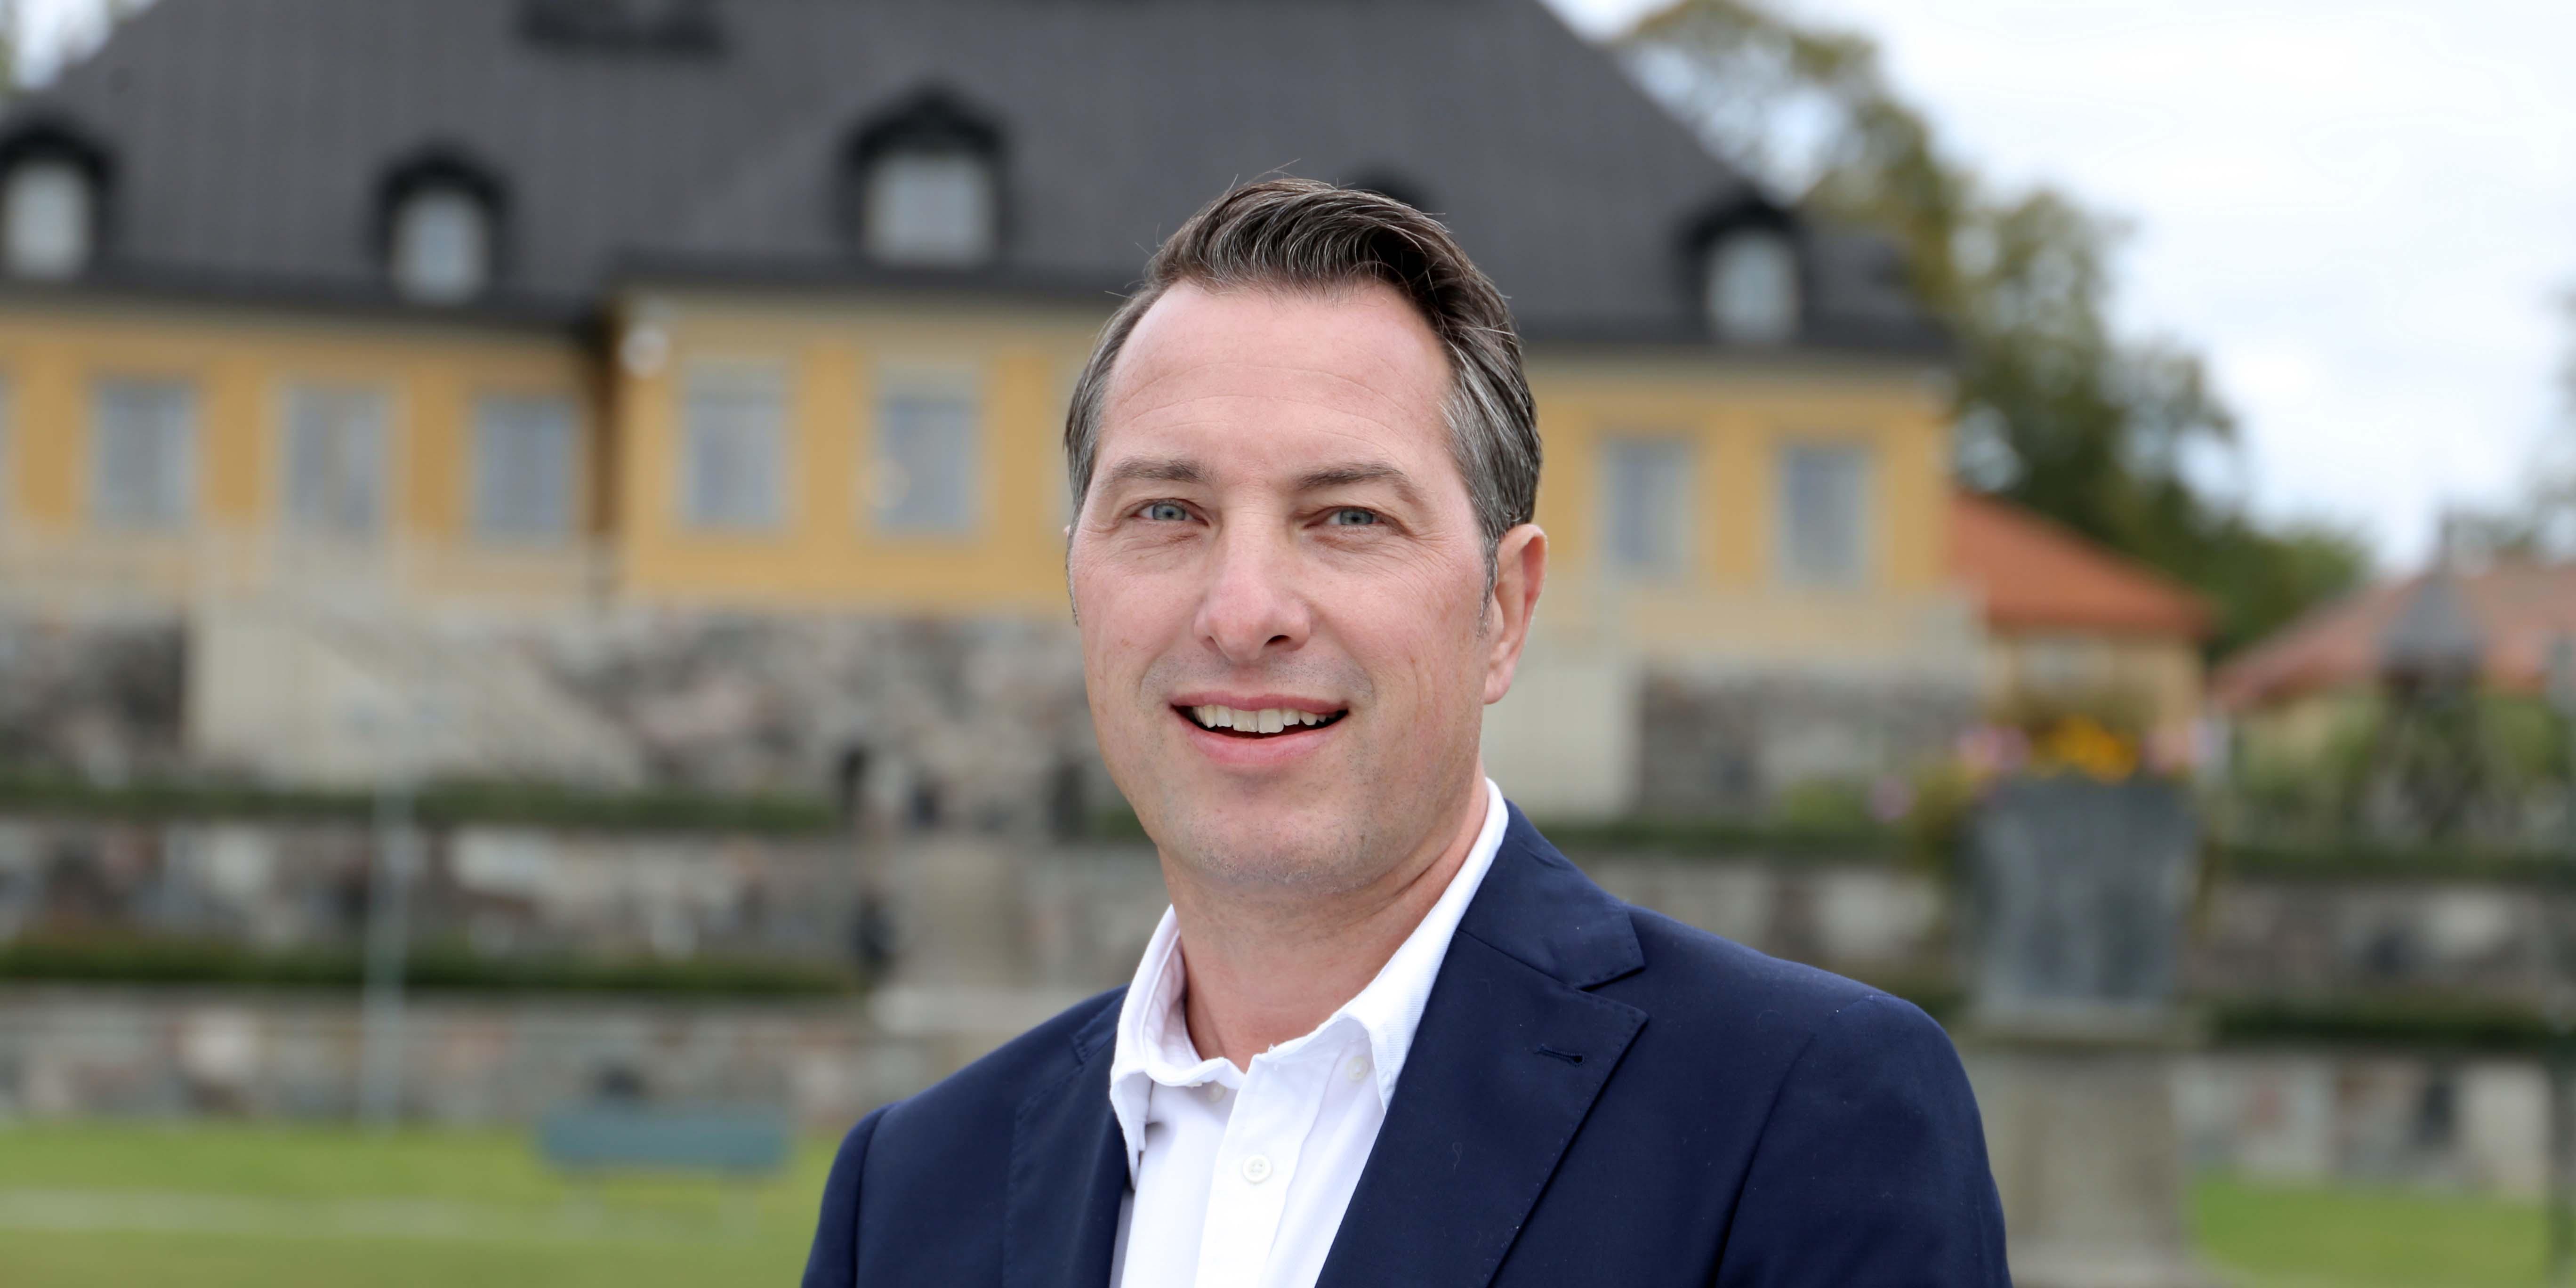 Thomas Järlö